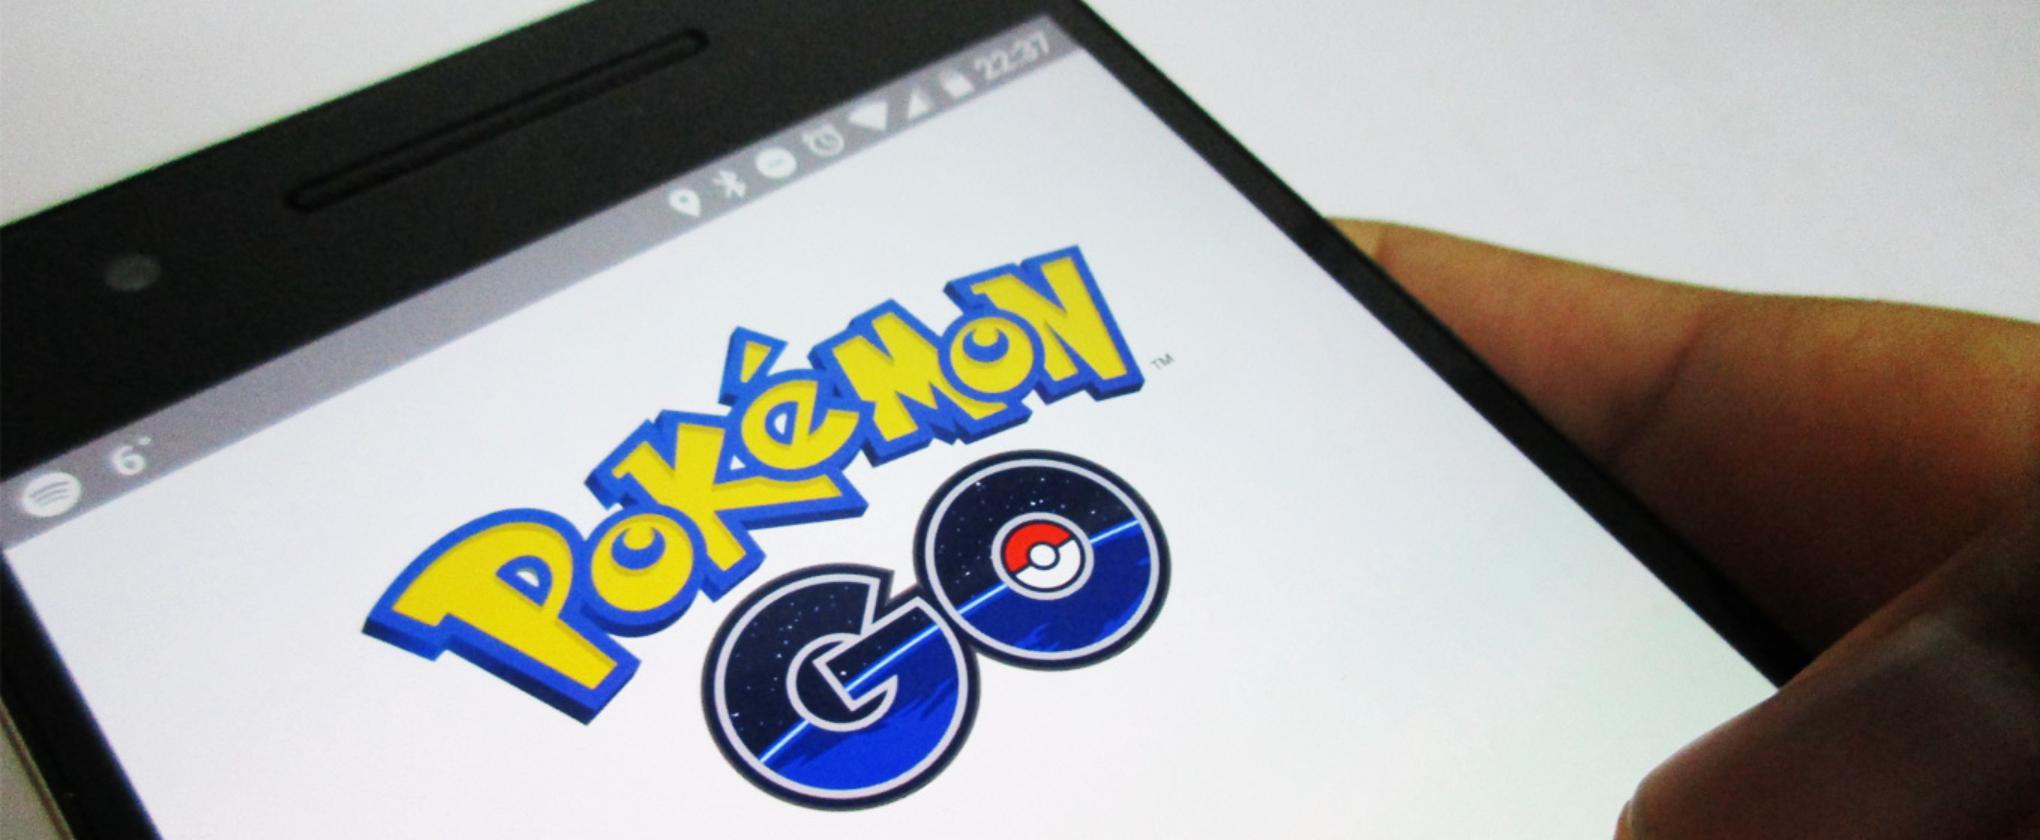 Pokémon Go: How Can Small Businesses Take Advantage?